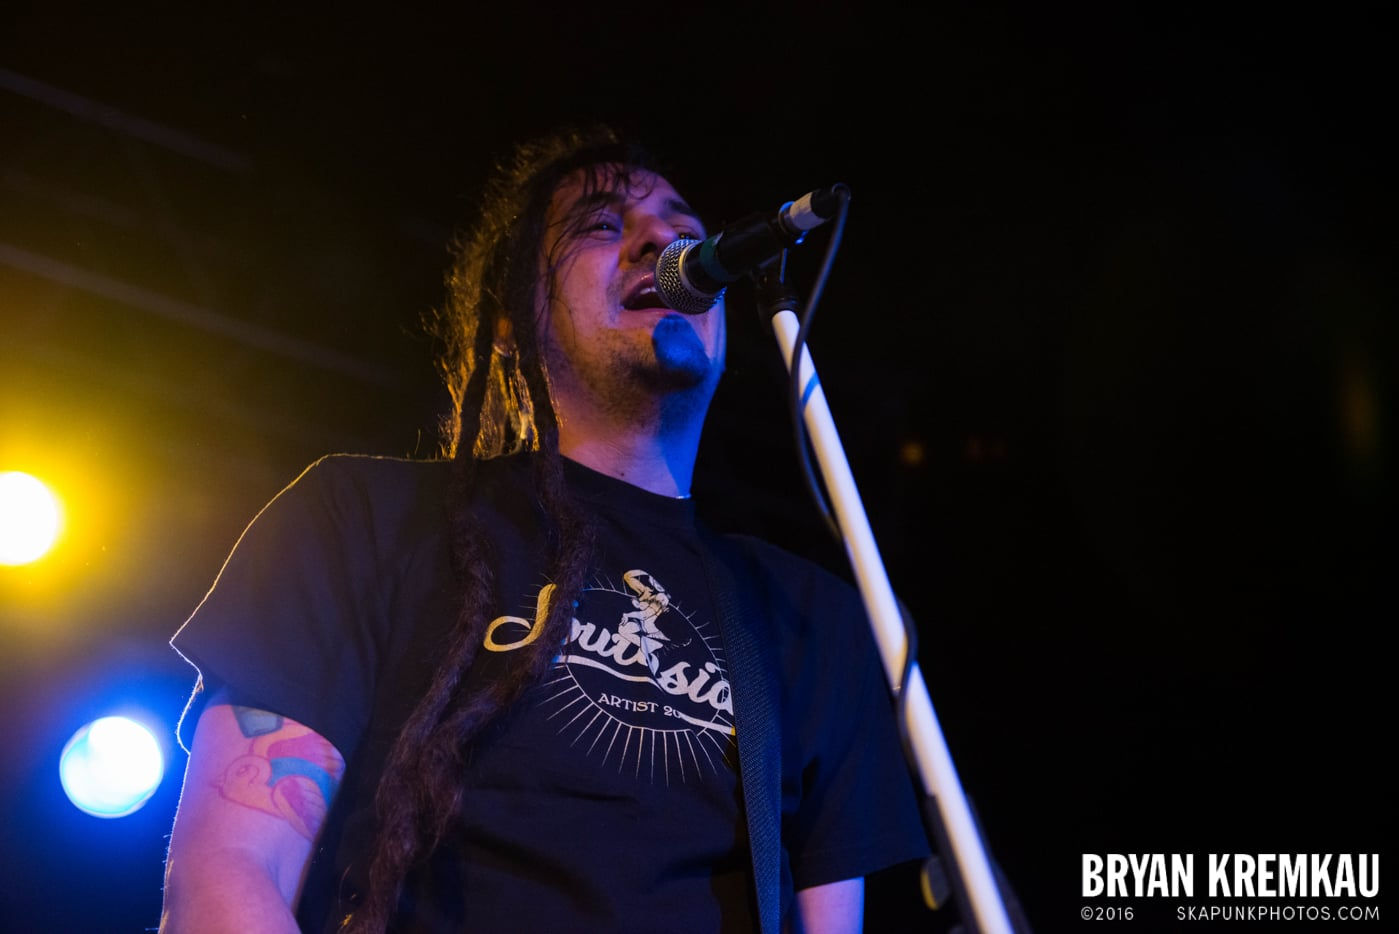 Less Than Jake @ Starland Ballroom, Sayreville, NJ - 11.9.13 (25)